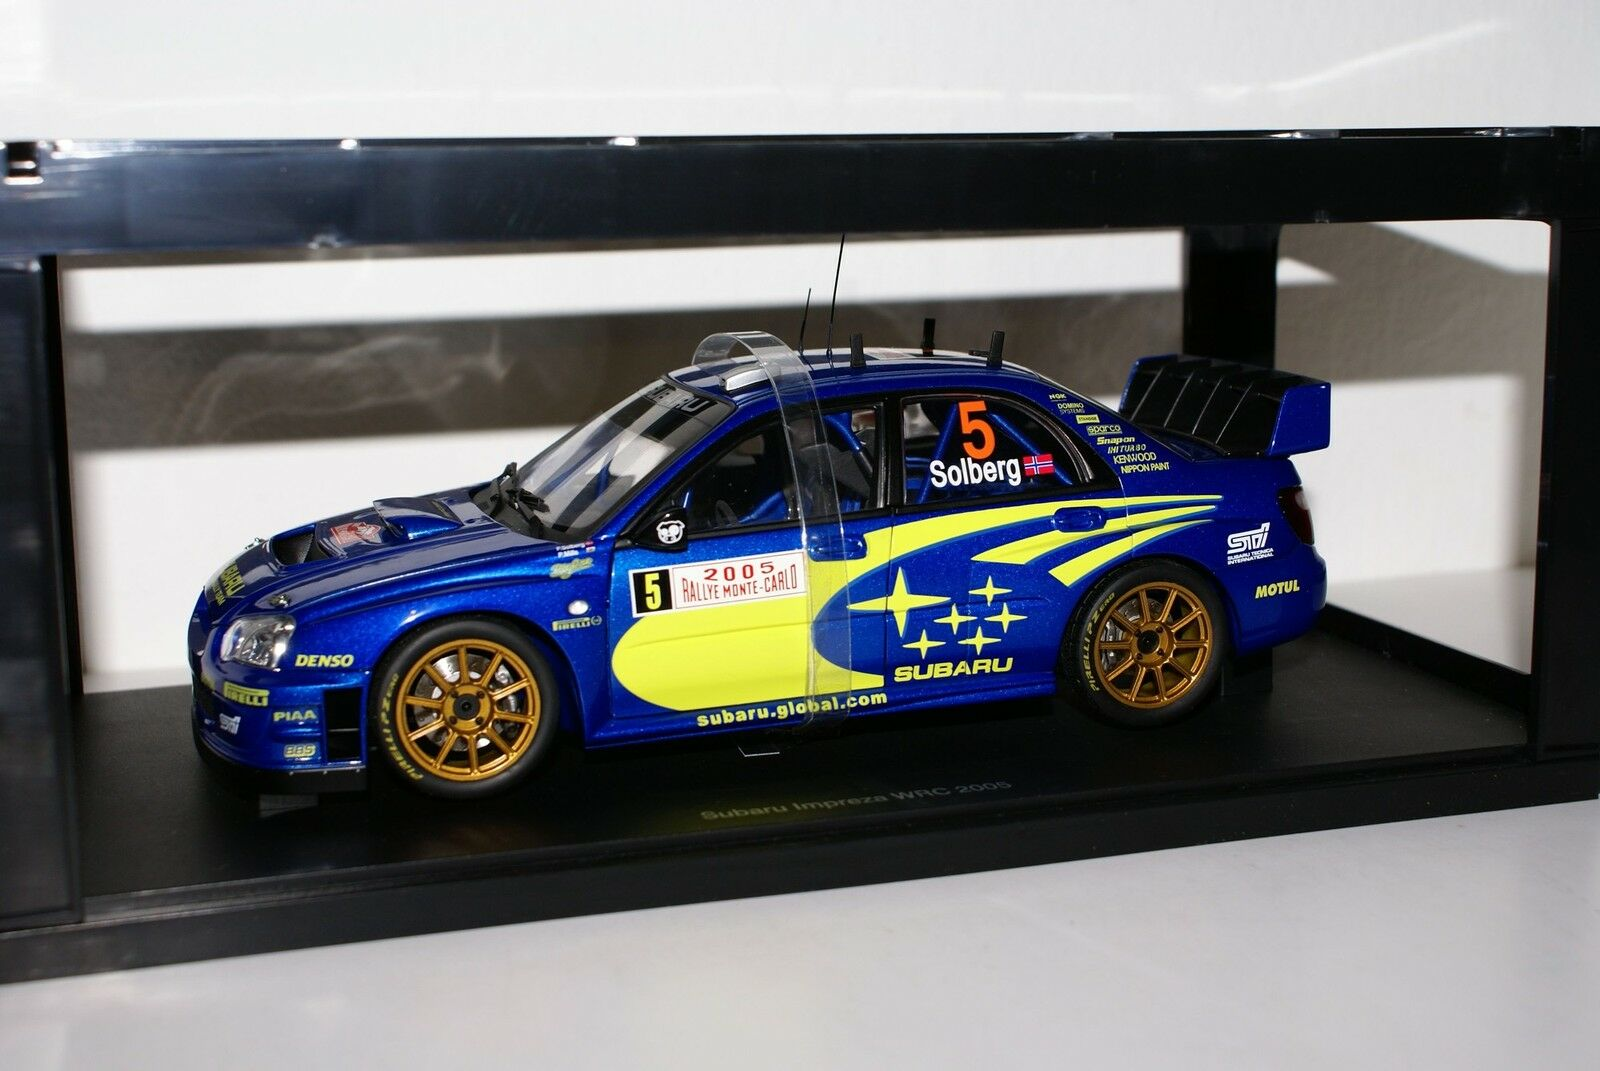 AUTO ART 1 18 - Subaru Impreza WRC-Monte Carlo 2005